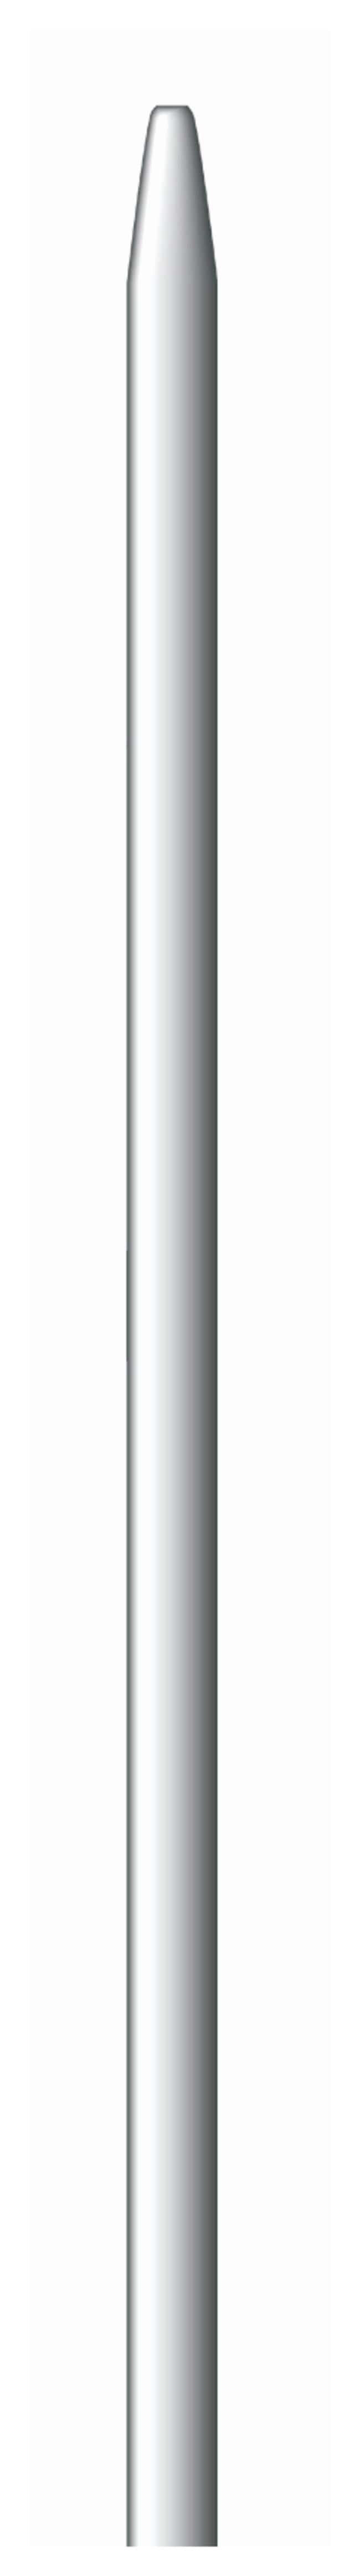 SGE™Aghi di ricambio per siringhe da 10 ul Needle length: 70mm; Gauge: 23; O.D.: 0.63mm; I.D.: 0.11mm; Tip style: cone; 2/Pk. SGE™Aghi di ricambio per siringhe da 10 ul